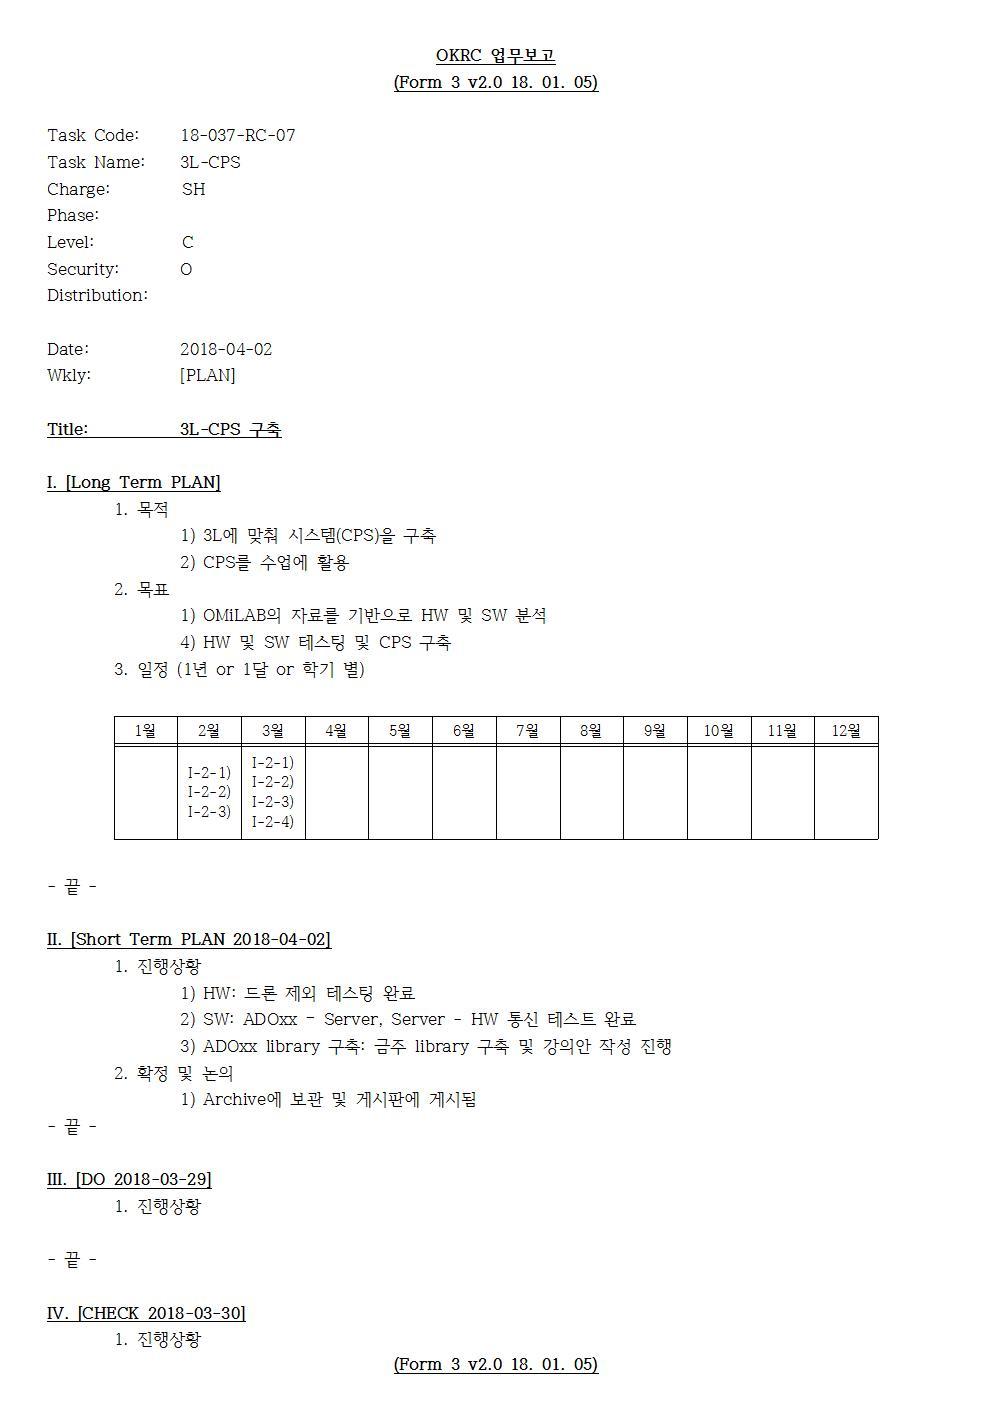 D-[18-037-RC-07]-[3L-CPS]-[2018-04-02][SH]001.jpg